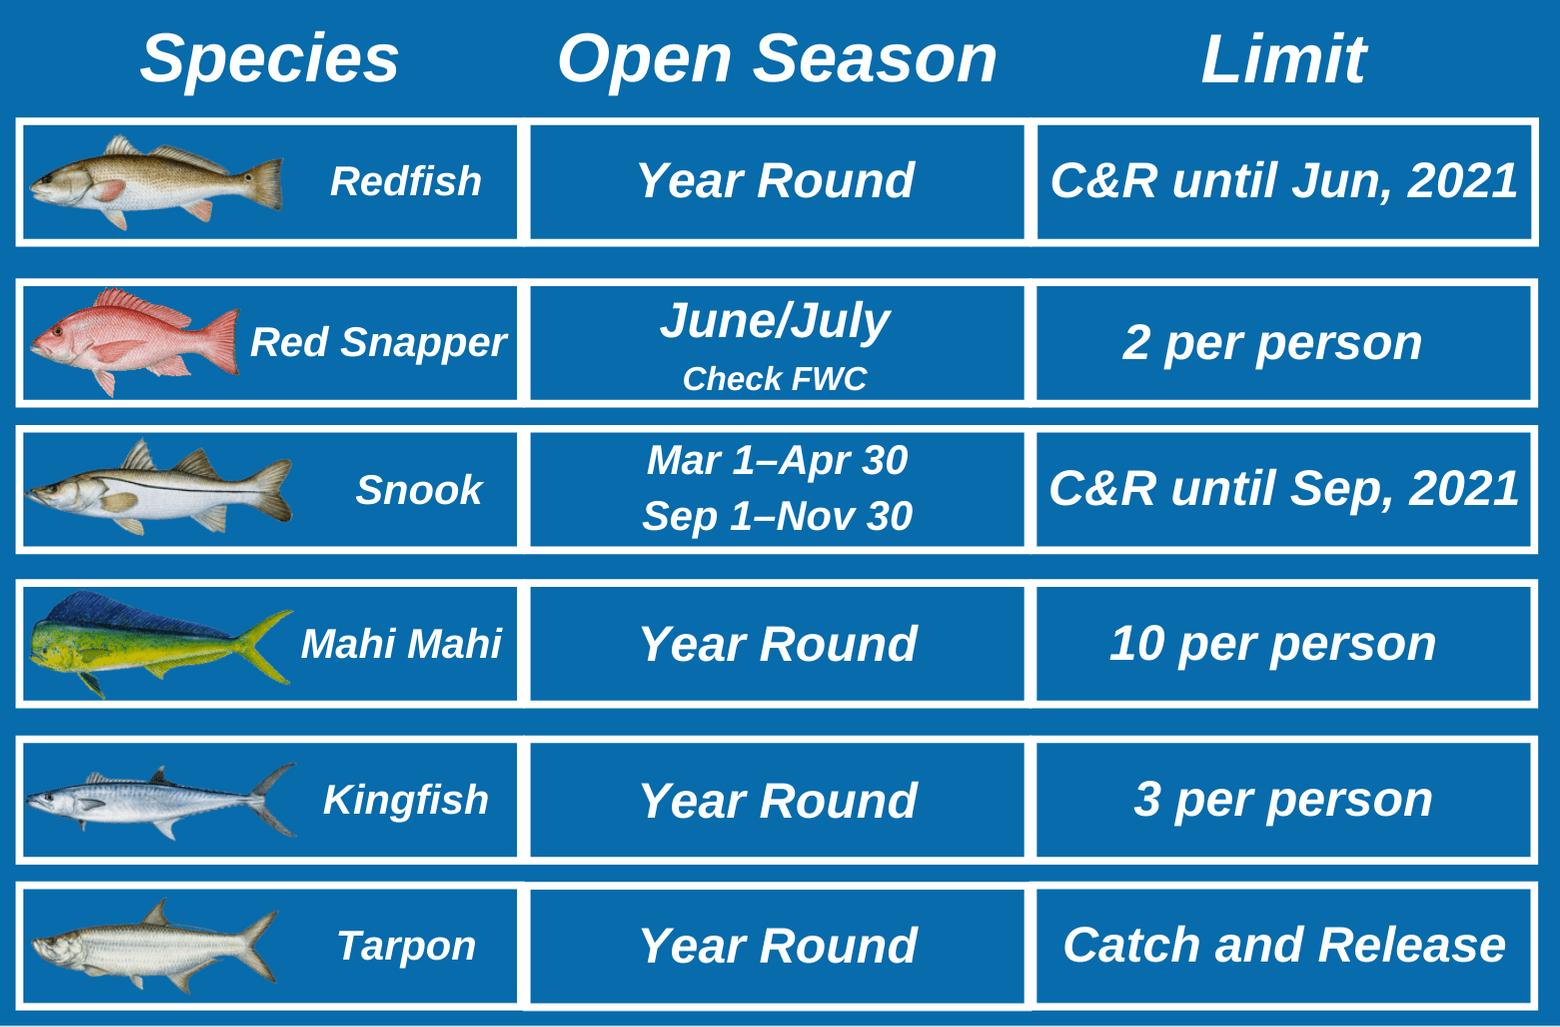 An infographic showing seasons and regulations for top Redfish, Red Snapper, Snook, Mahi Mahi, Kingfish, and Tarpon in Boca Grande, Florida